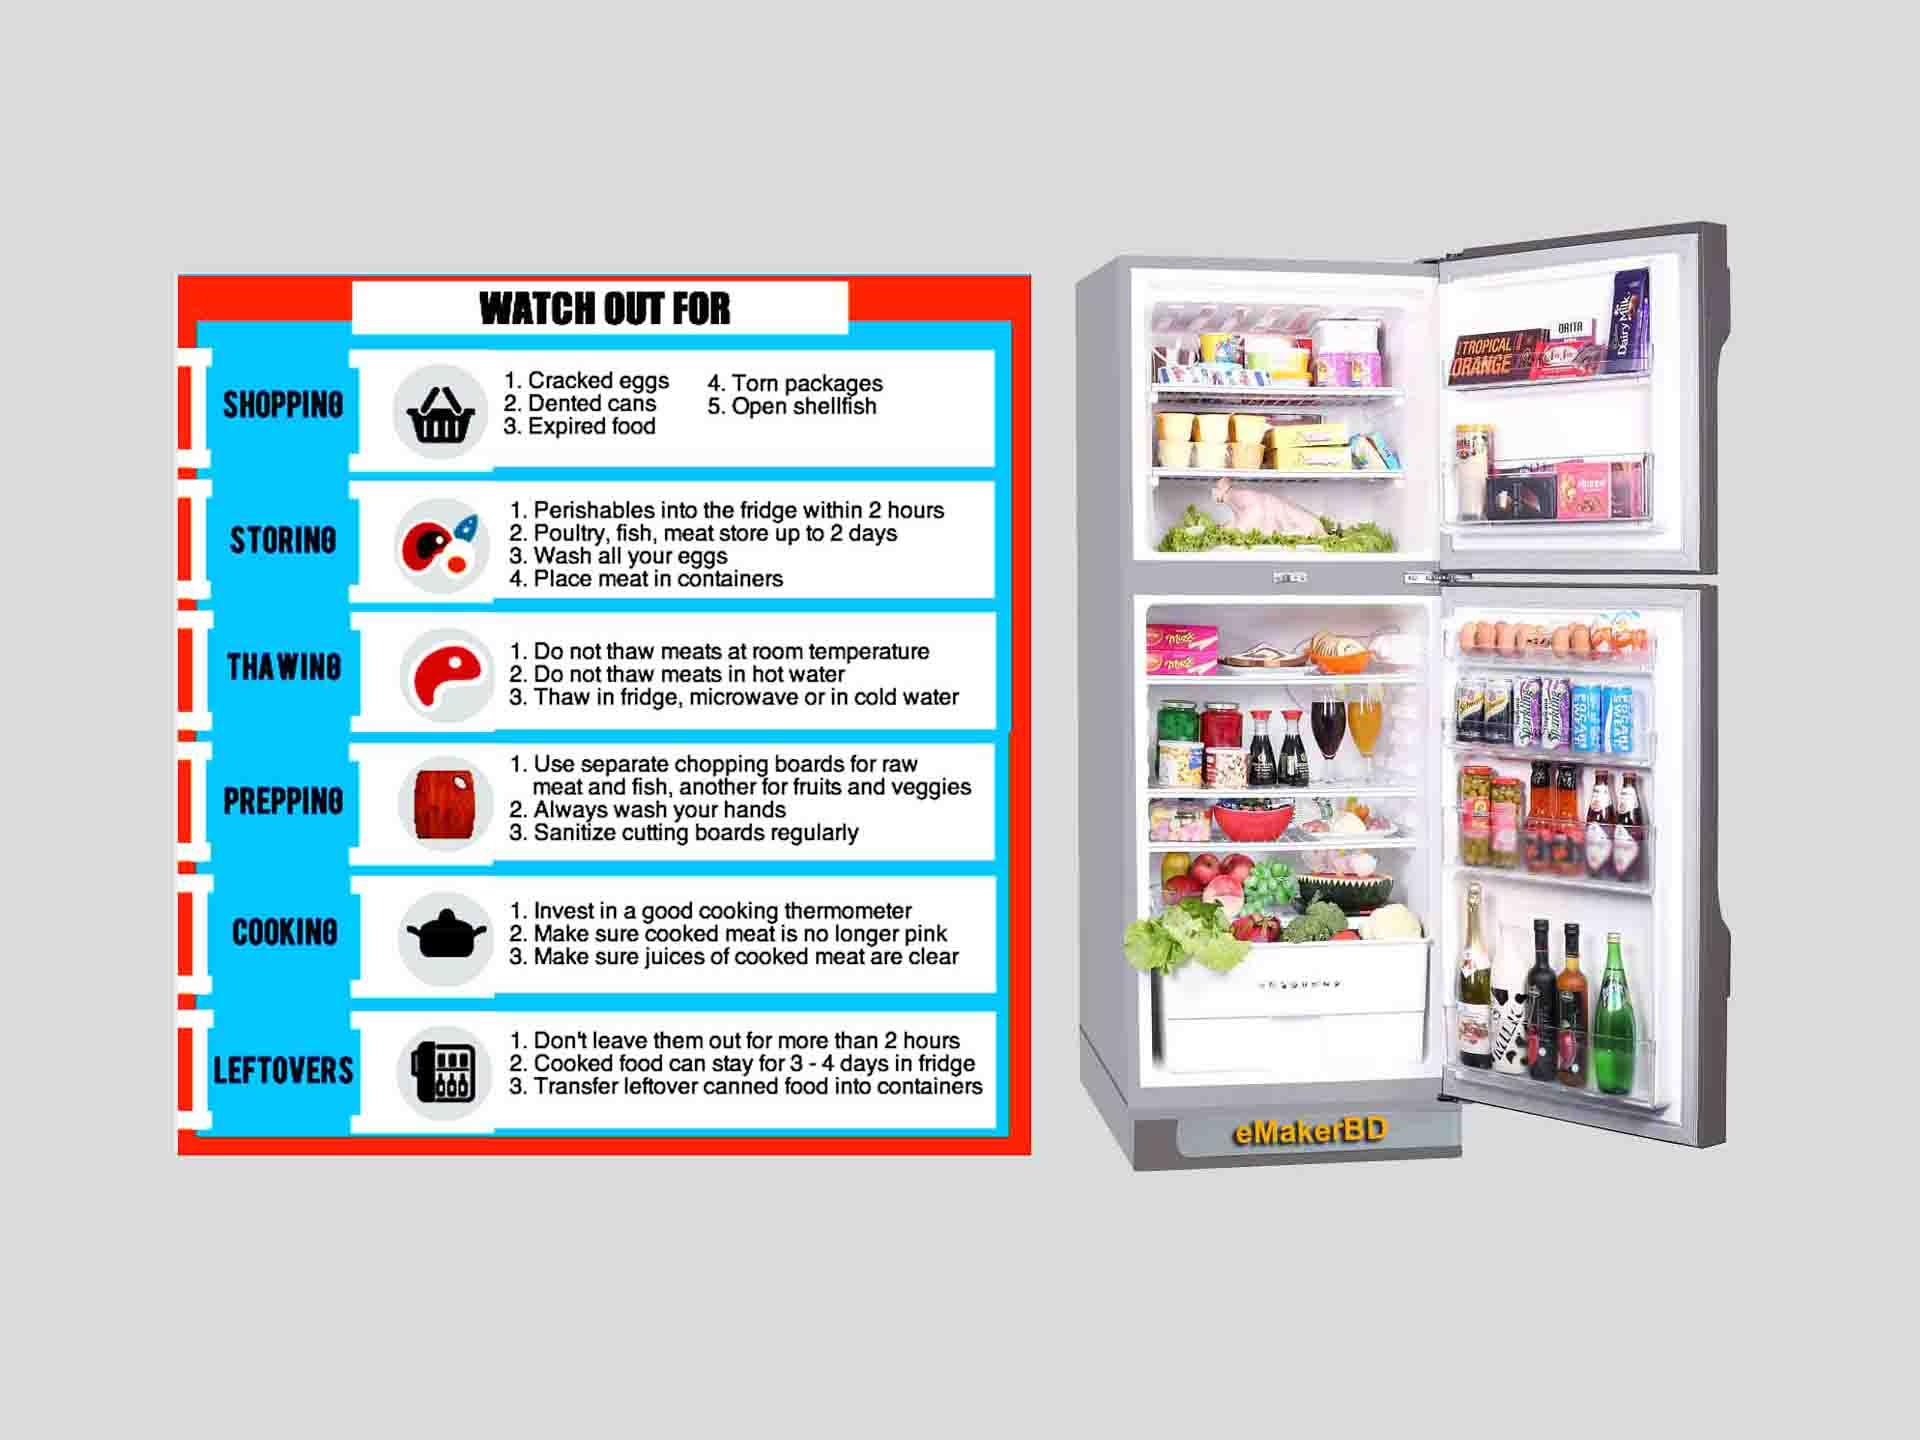 New fridge operating guide নতুন ফ্রিজ চালানোর নিয়ম